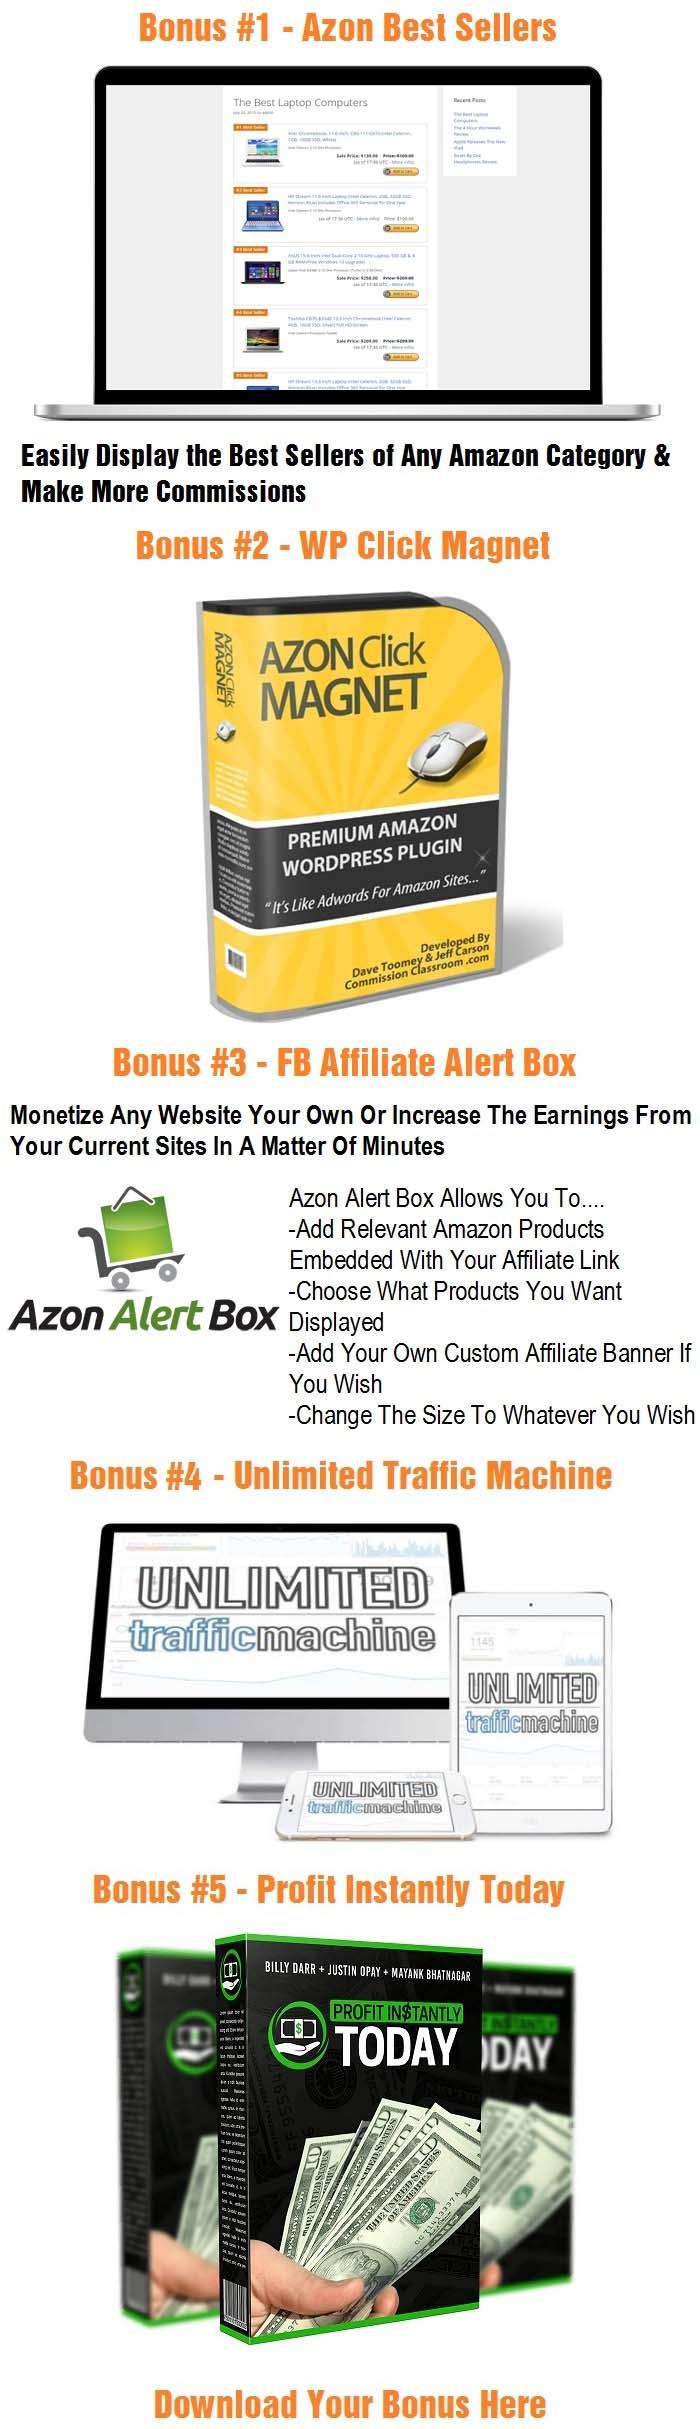 PLR Fulfilment By Amazon Bonus